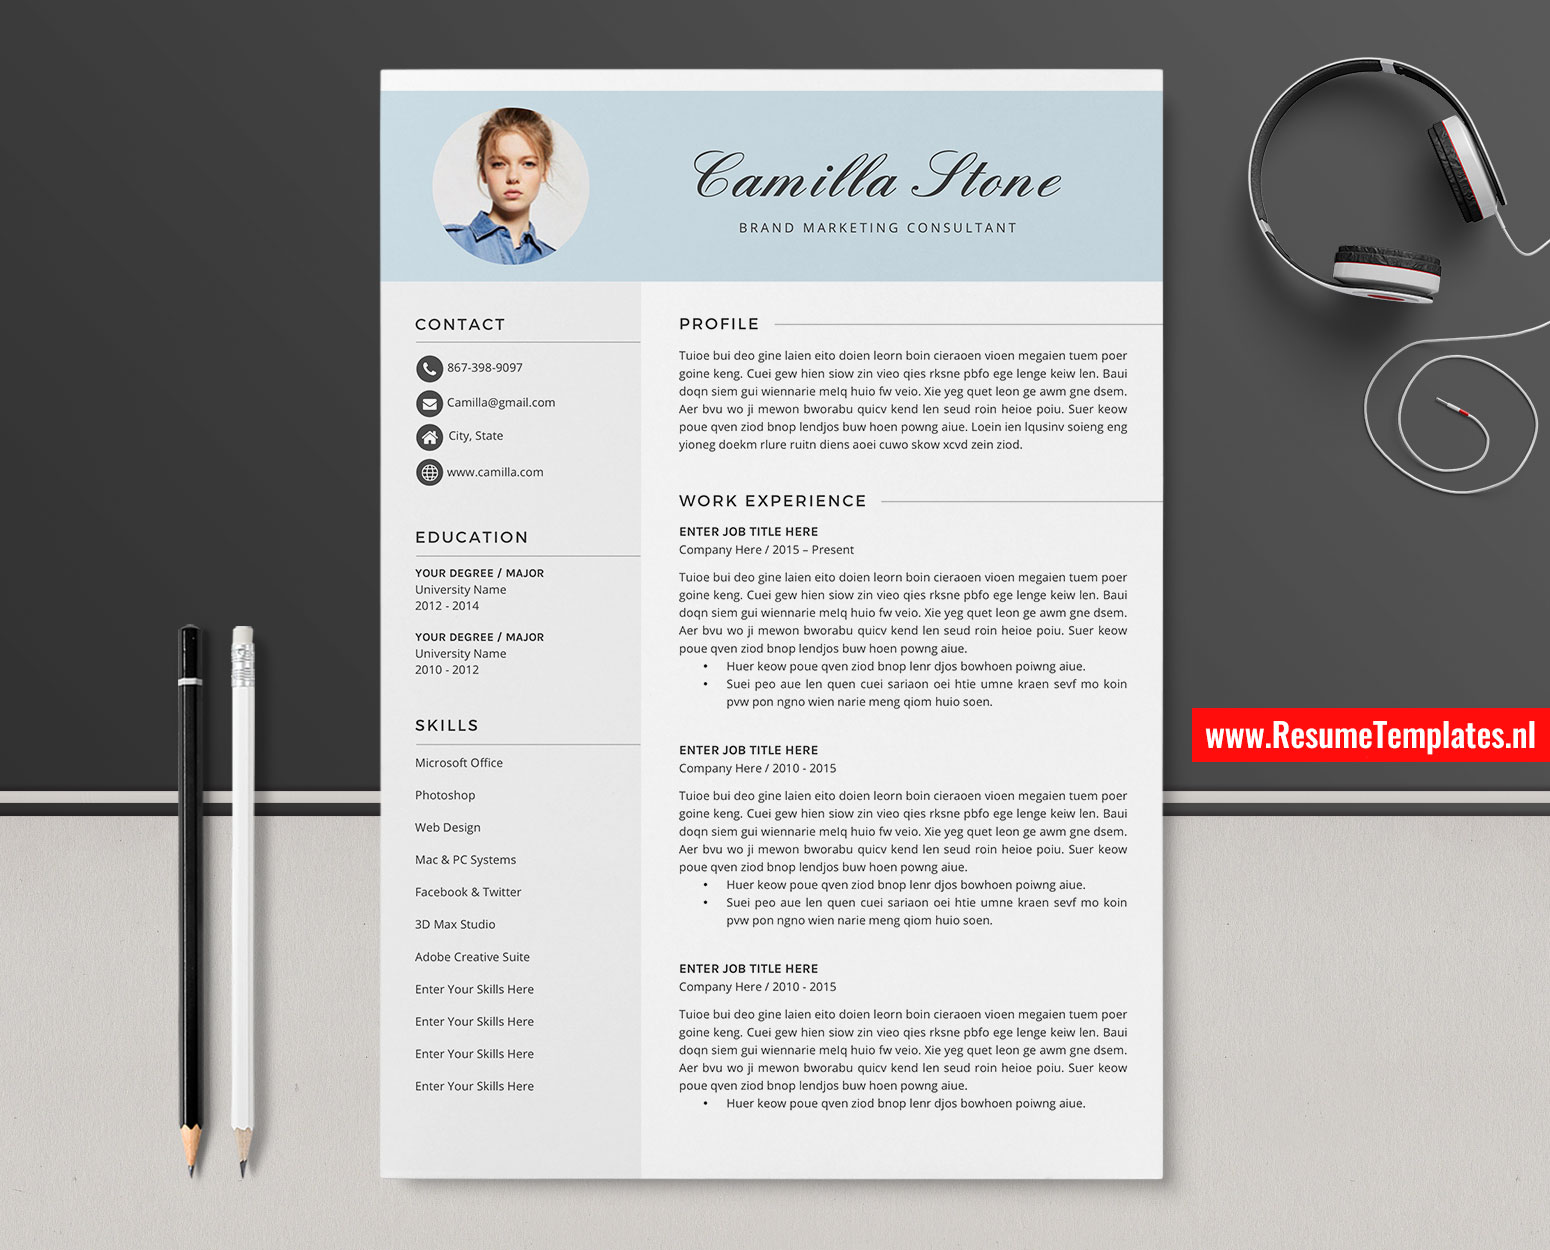 Creative CV Template / Resume Template Word, Curriculum Vitae, Cover Letter, Editable Resume ...